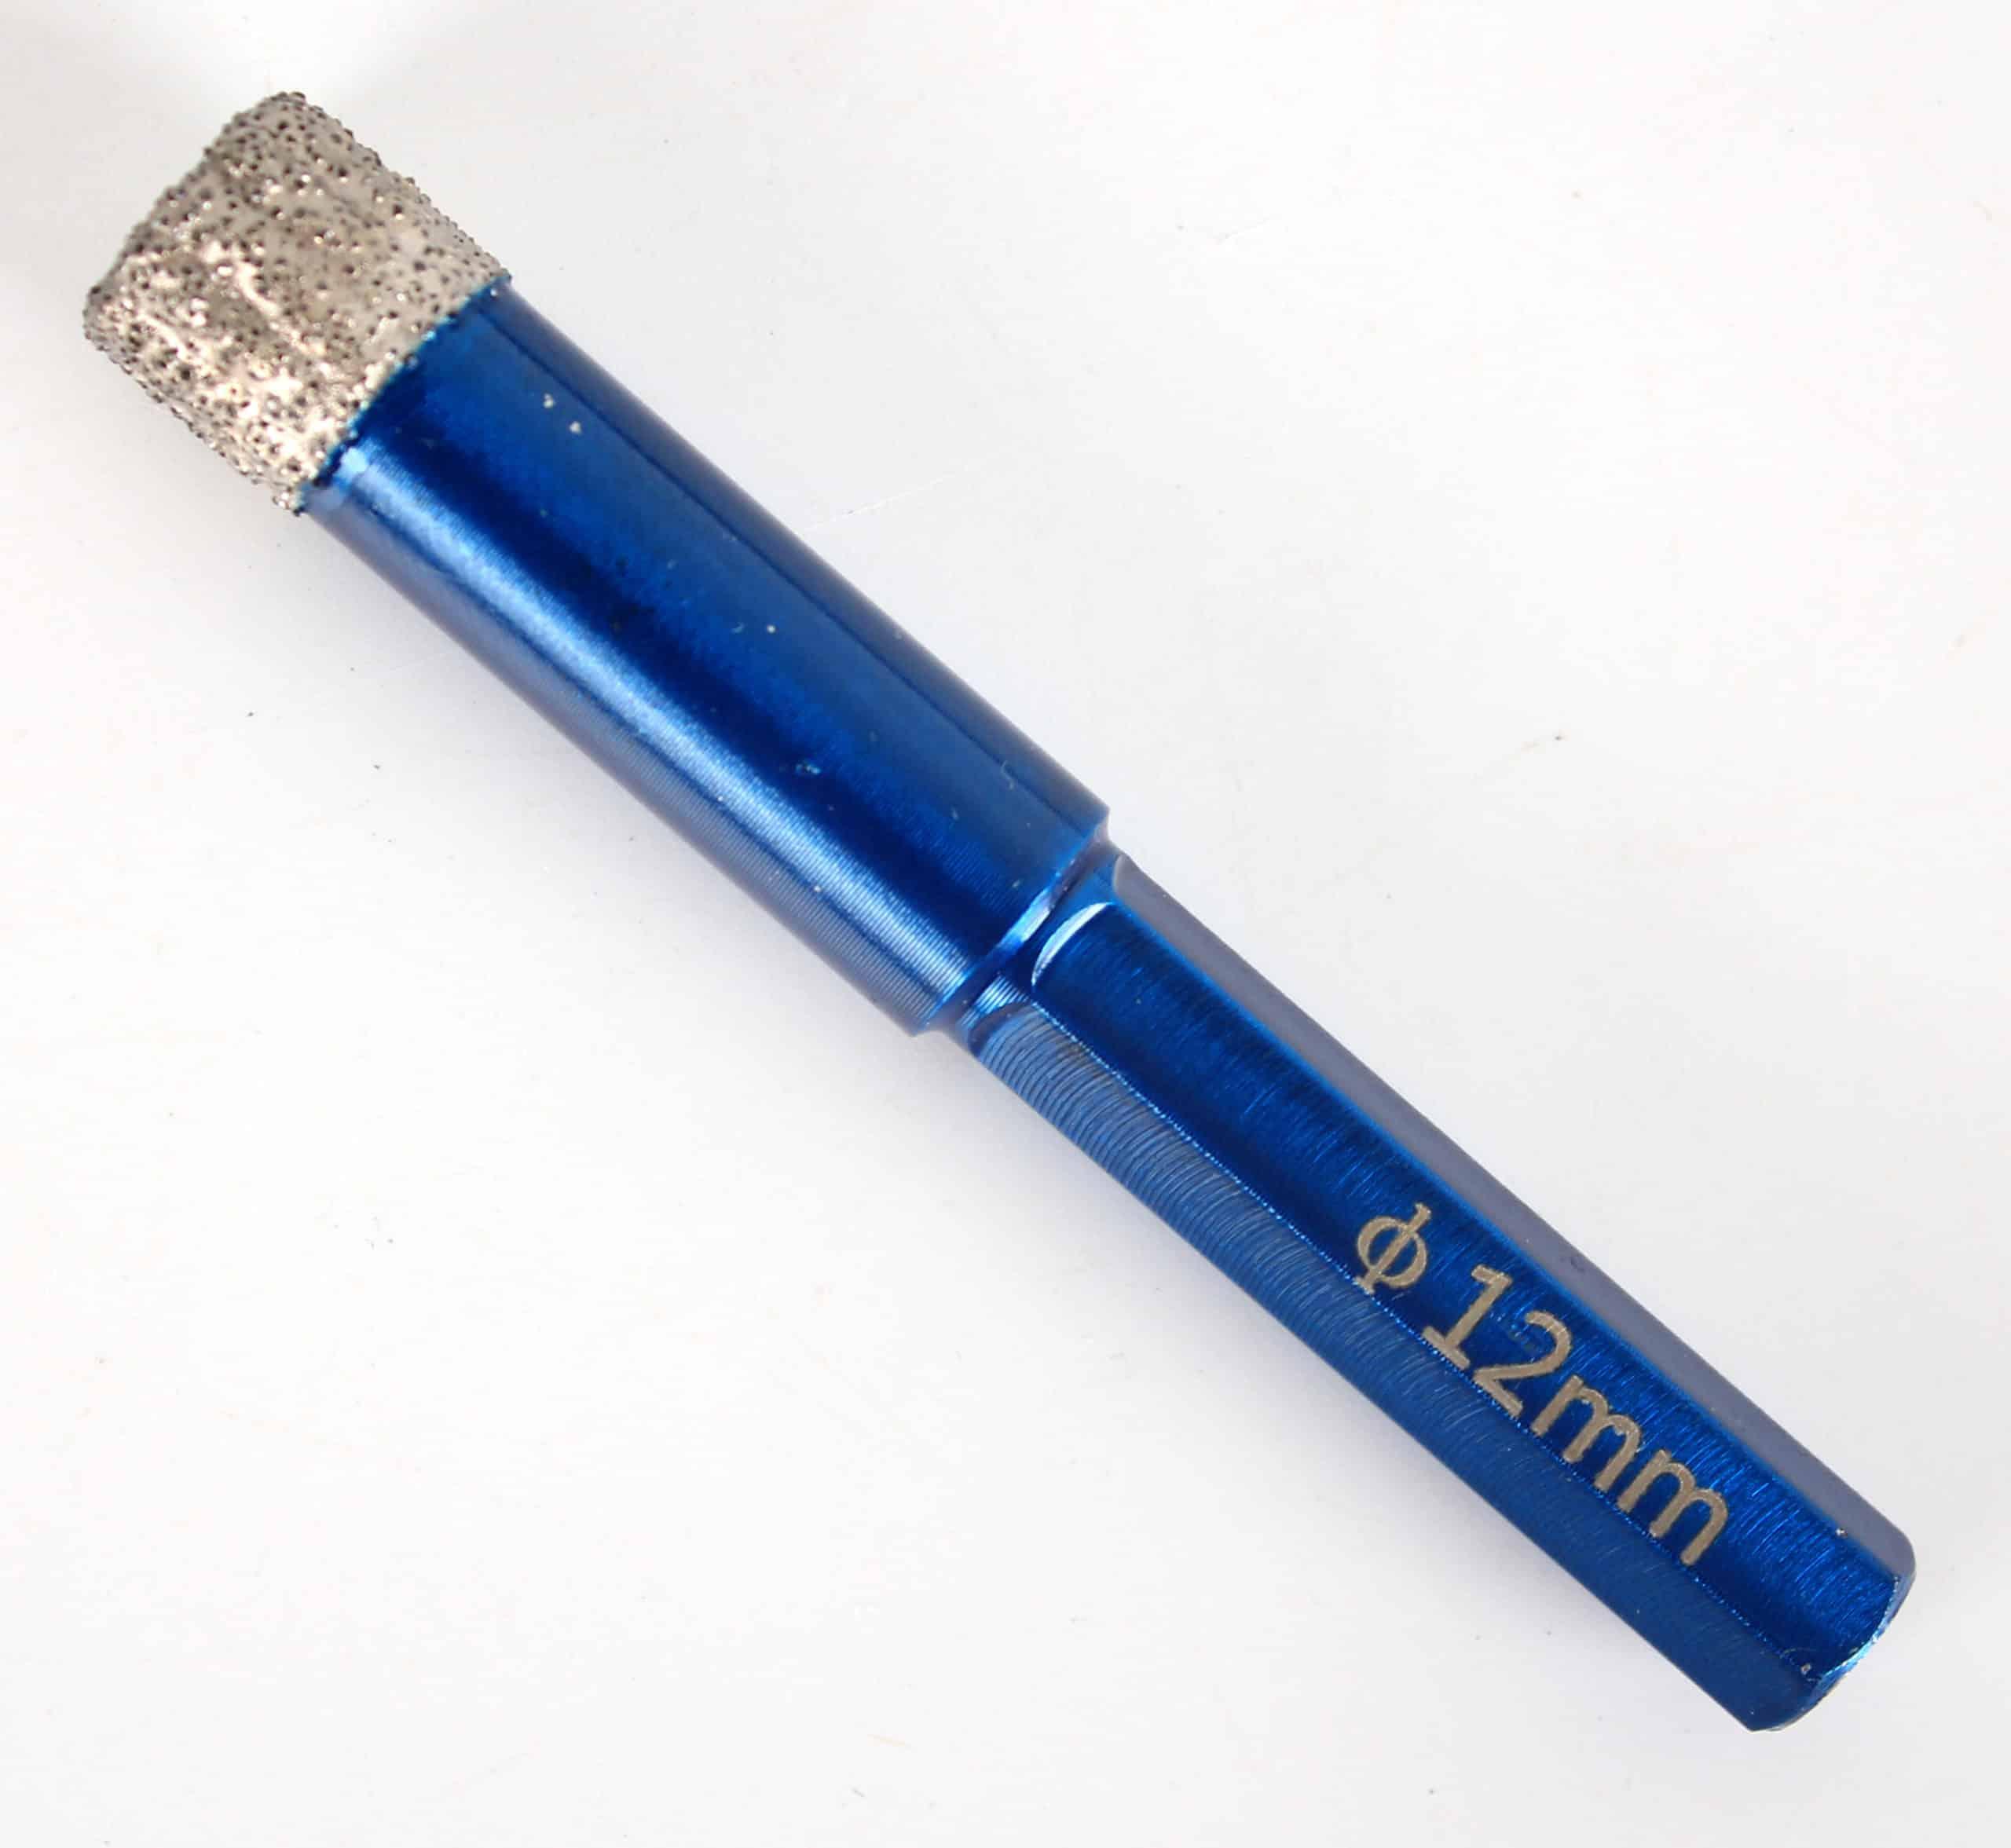 Diamond Drill Bit | Ceramic | Porcelain | Tile | Granite | Marble | Hexagon Shank 5/6/8/10/12/14 mm Hole Saw Cutter Power Tool